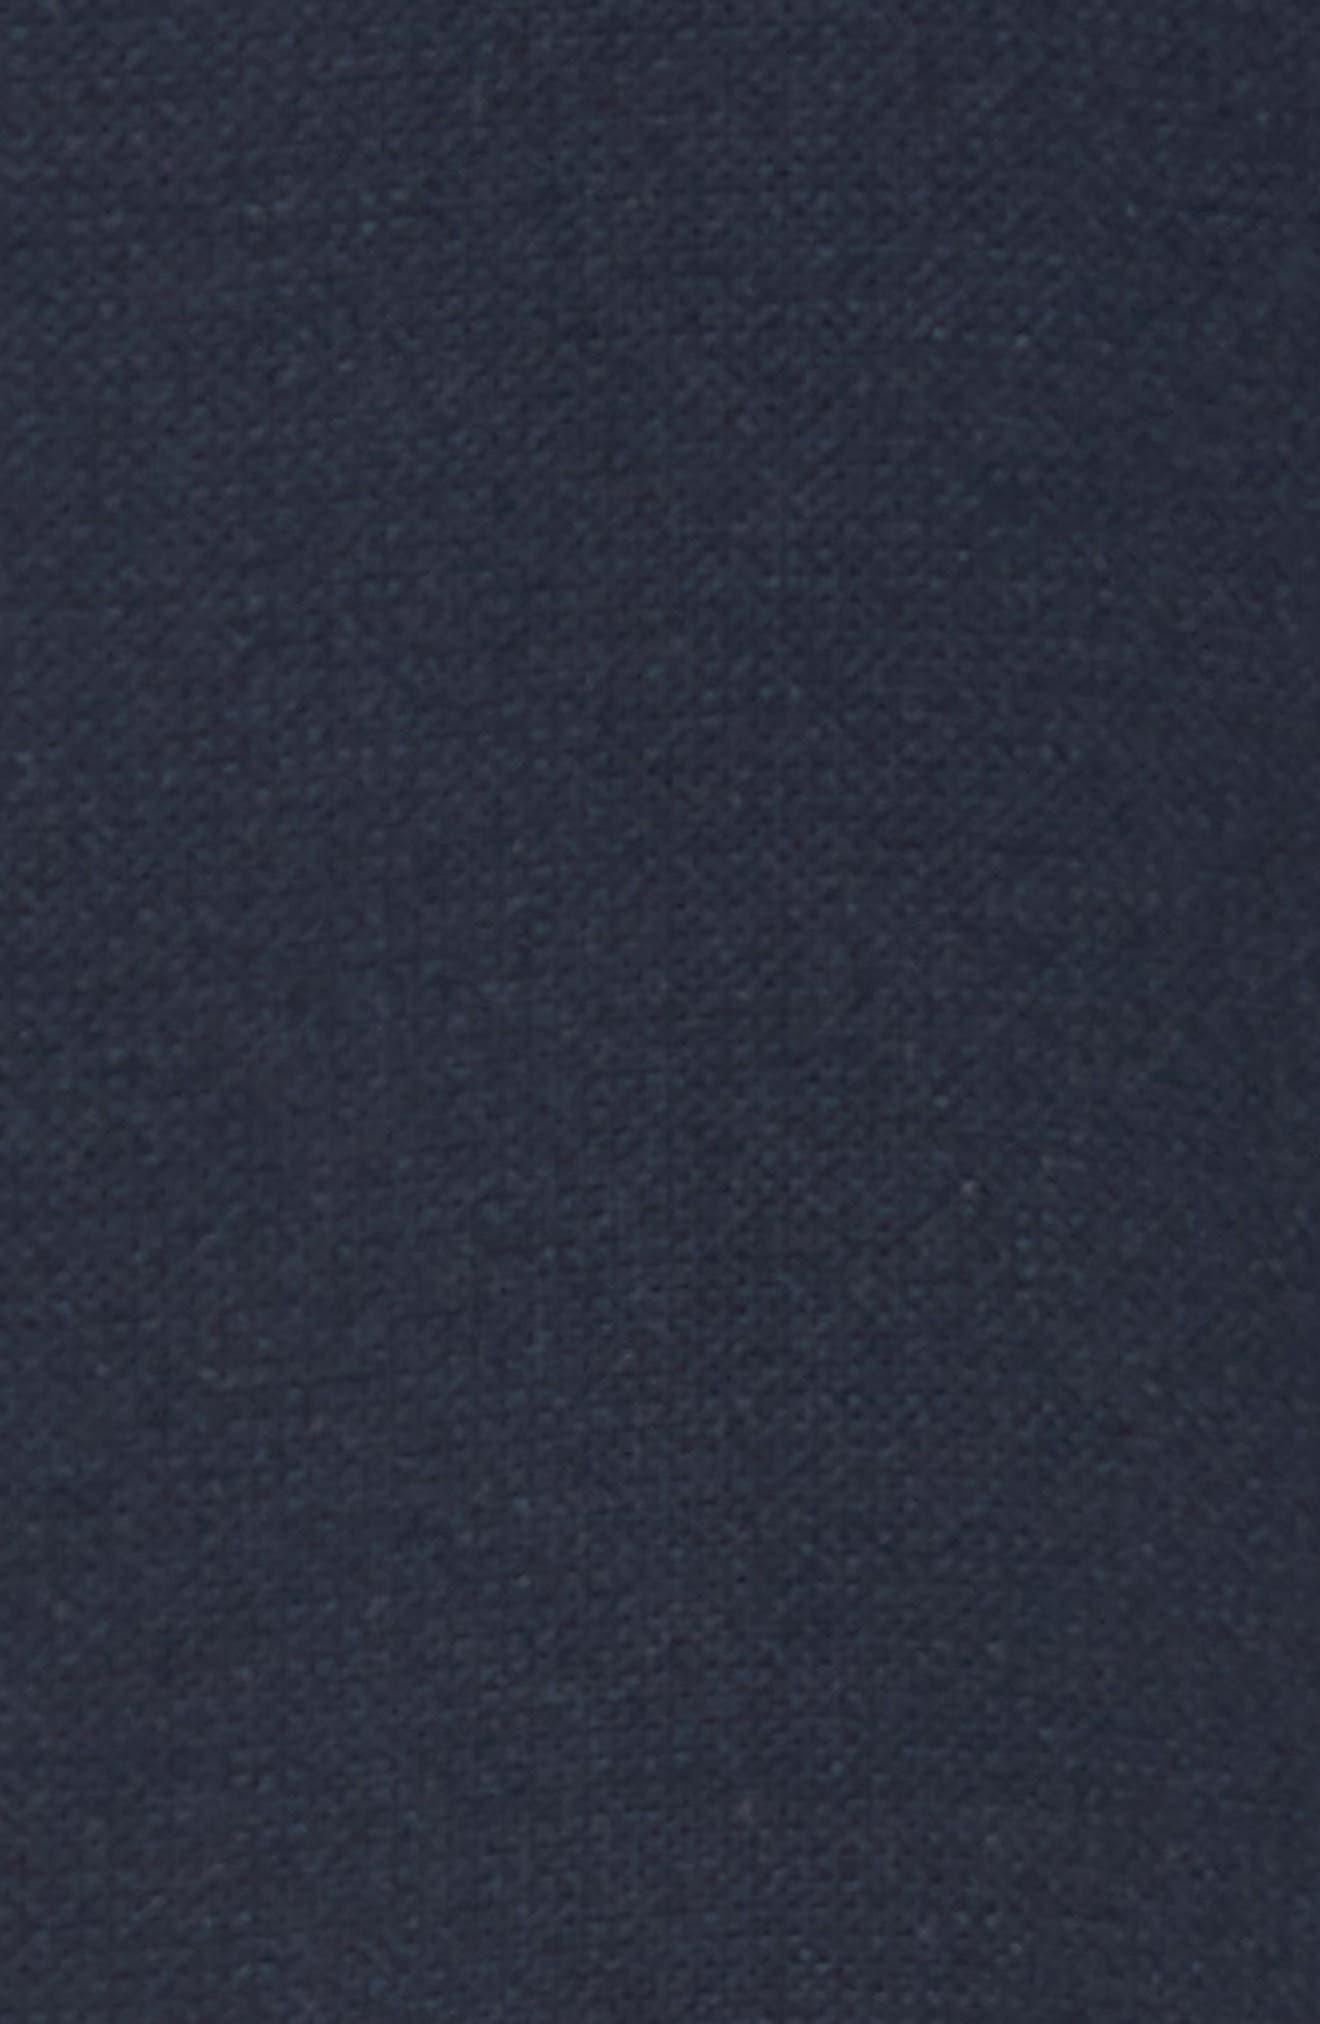 Colorblock Slim Fit Bomber Jacket,                             Alternate thumbnail 6, color,                             NAVY/ BLACK